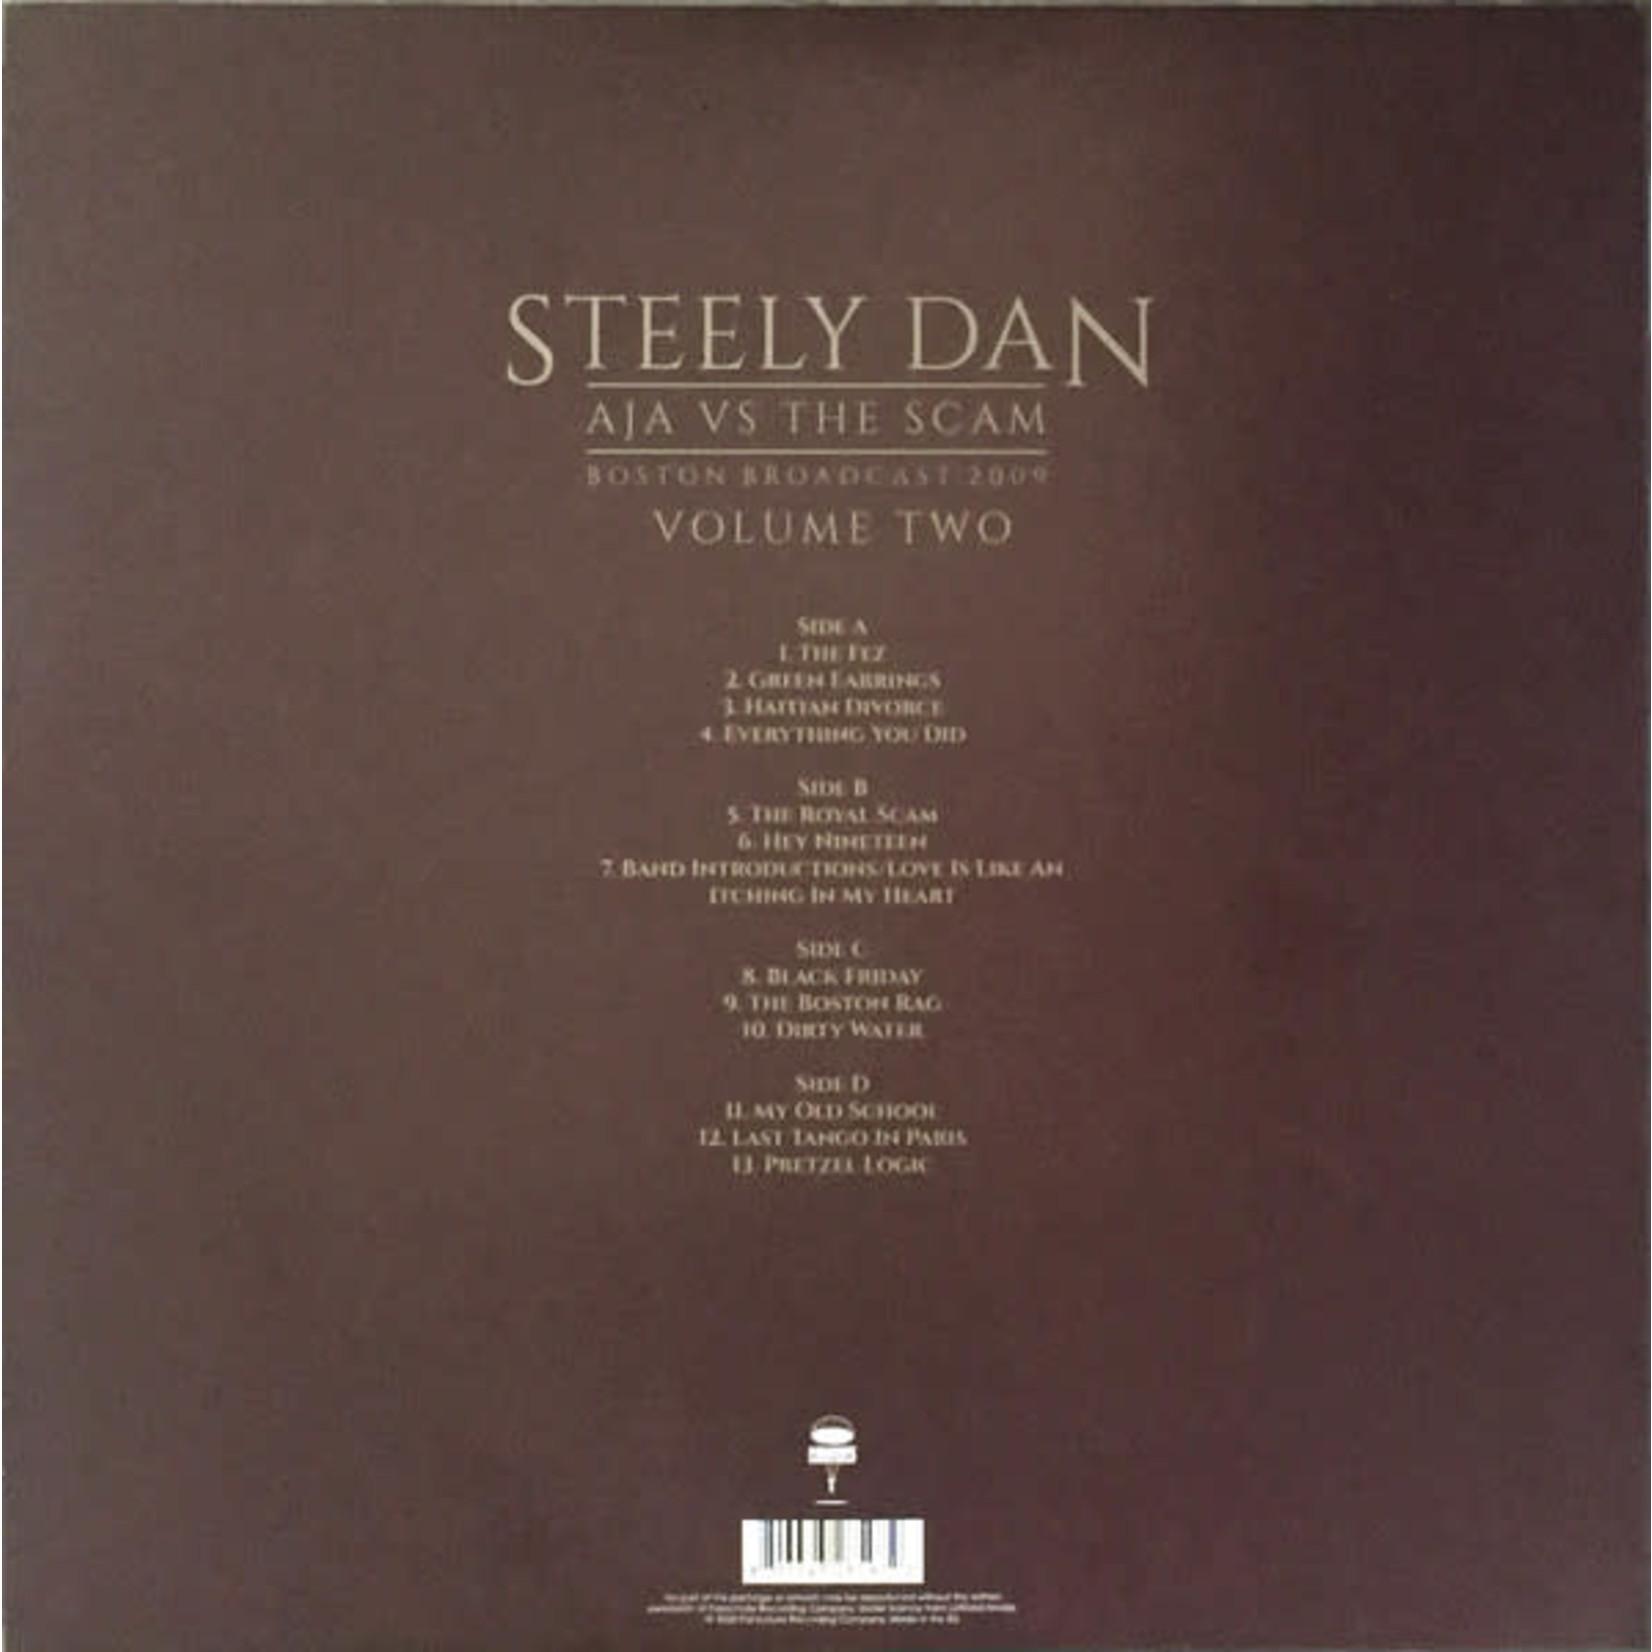 STEELY DAN AJA VS. THE SCAM VOL. 2 (2LP)